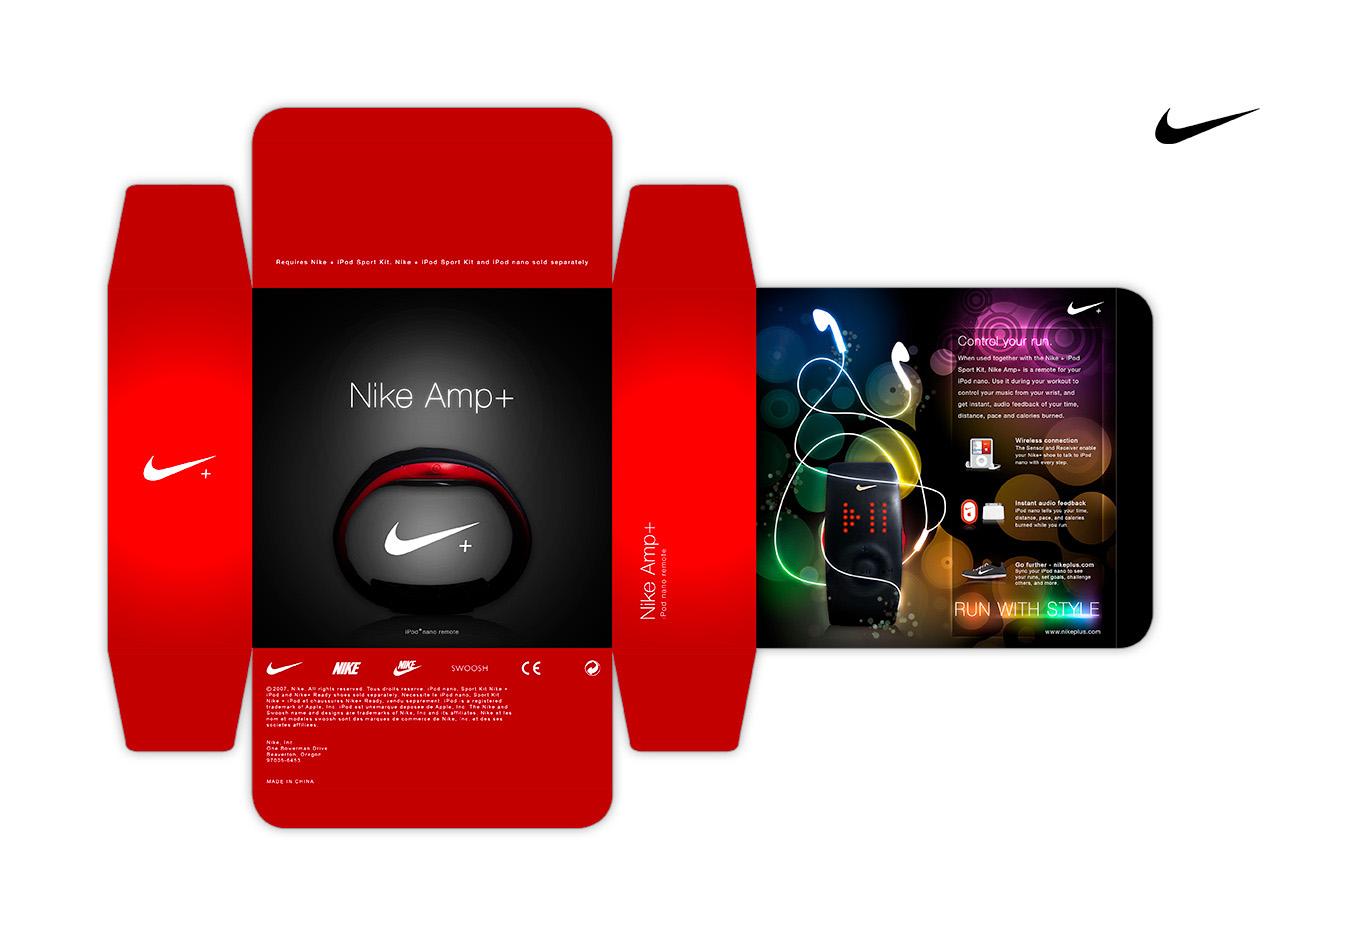 Best Nike Box Designs